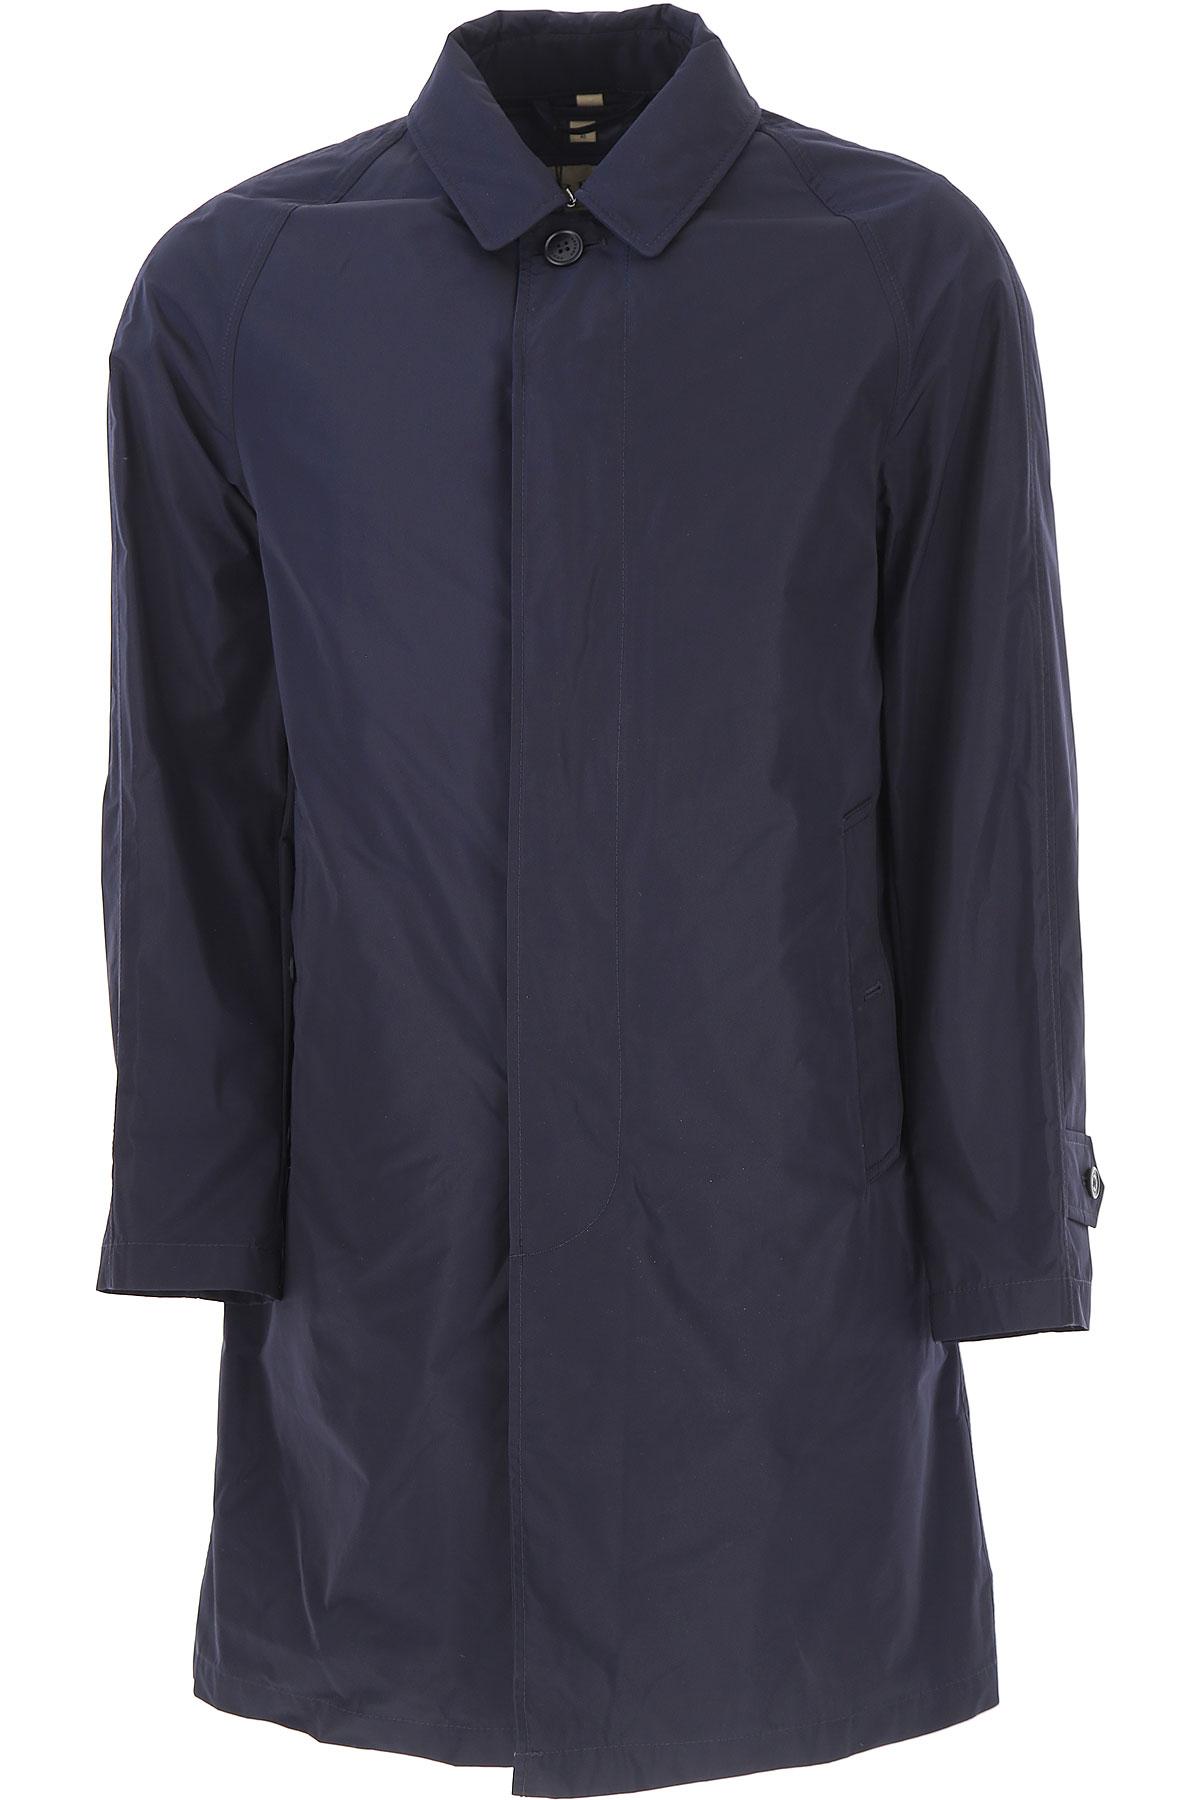 Image of Burberry Men\'s Coat, Blue Navy, polyester, 2017, L M S XL XXL